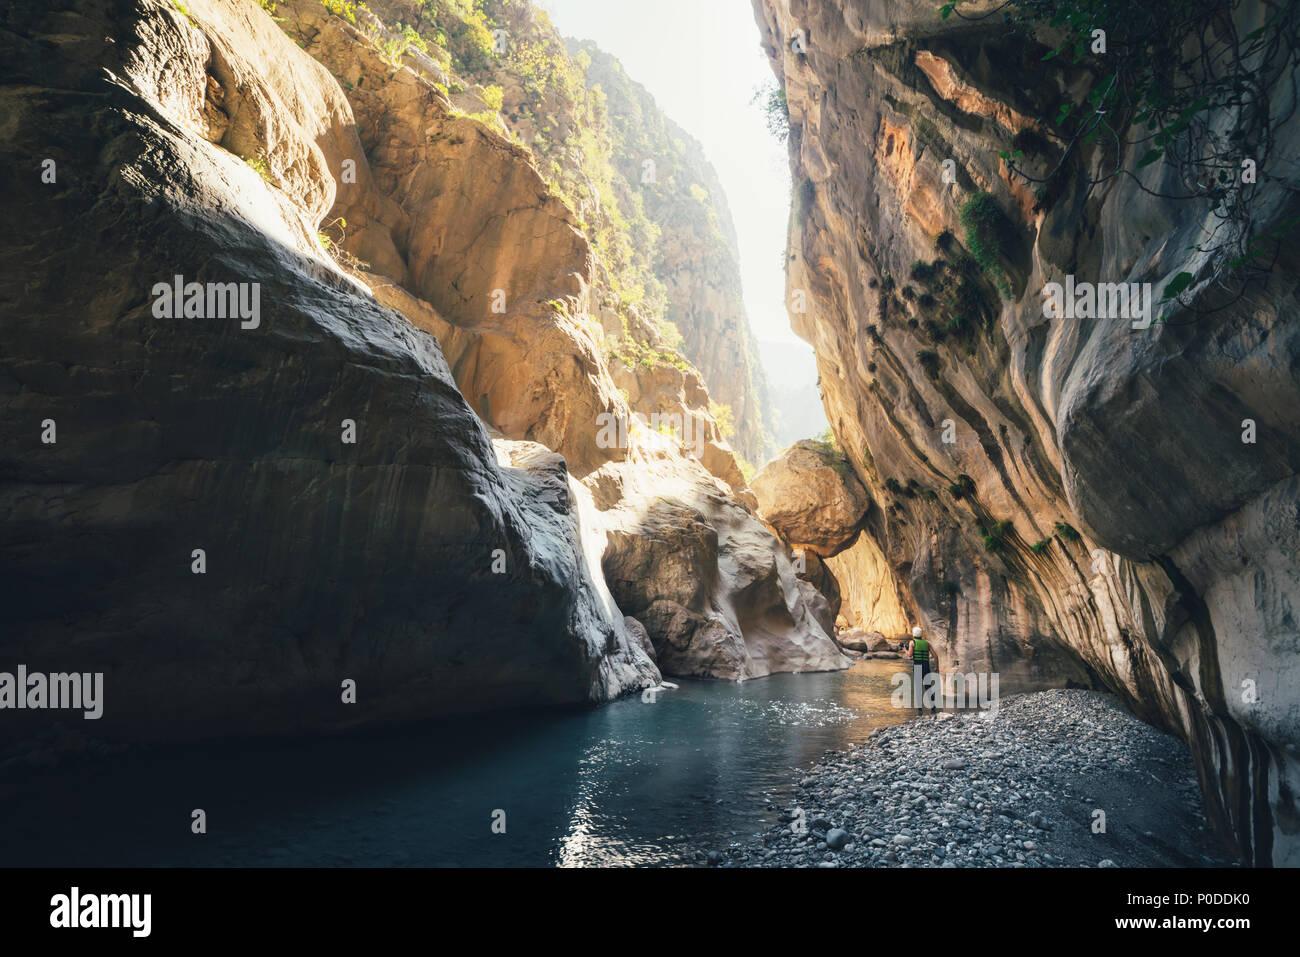 Amazing view of Goynuk canyon - Stock Image